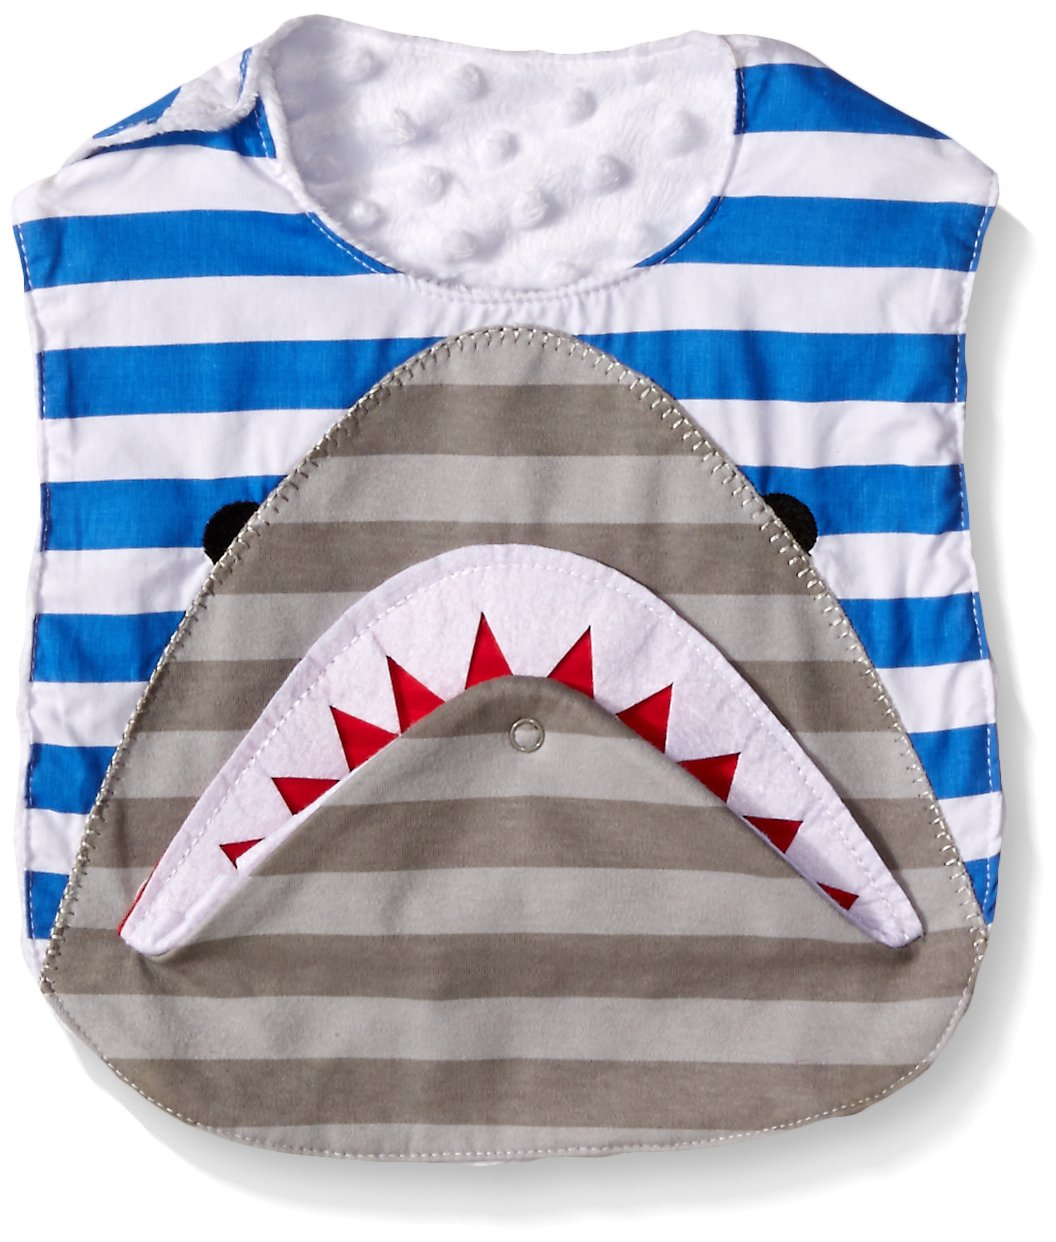 Mud Pie Baby Boys' Applique Bib, Shark Flap, One Size